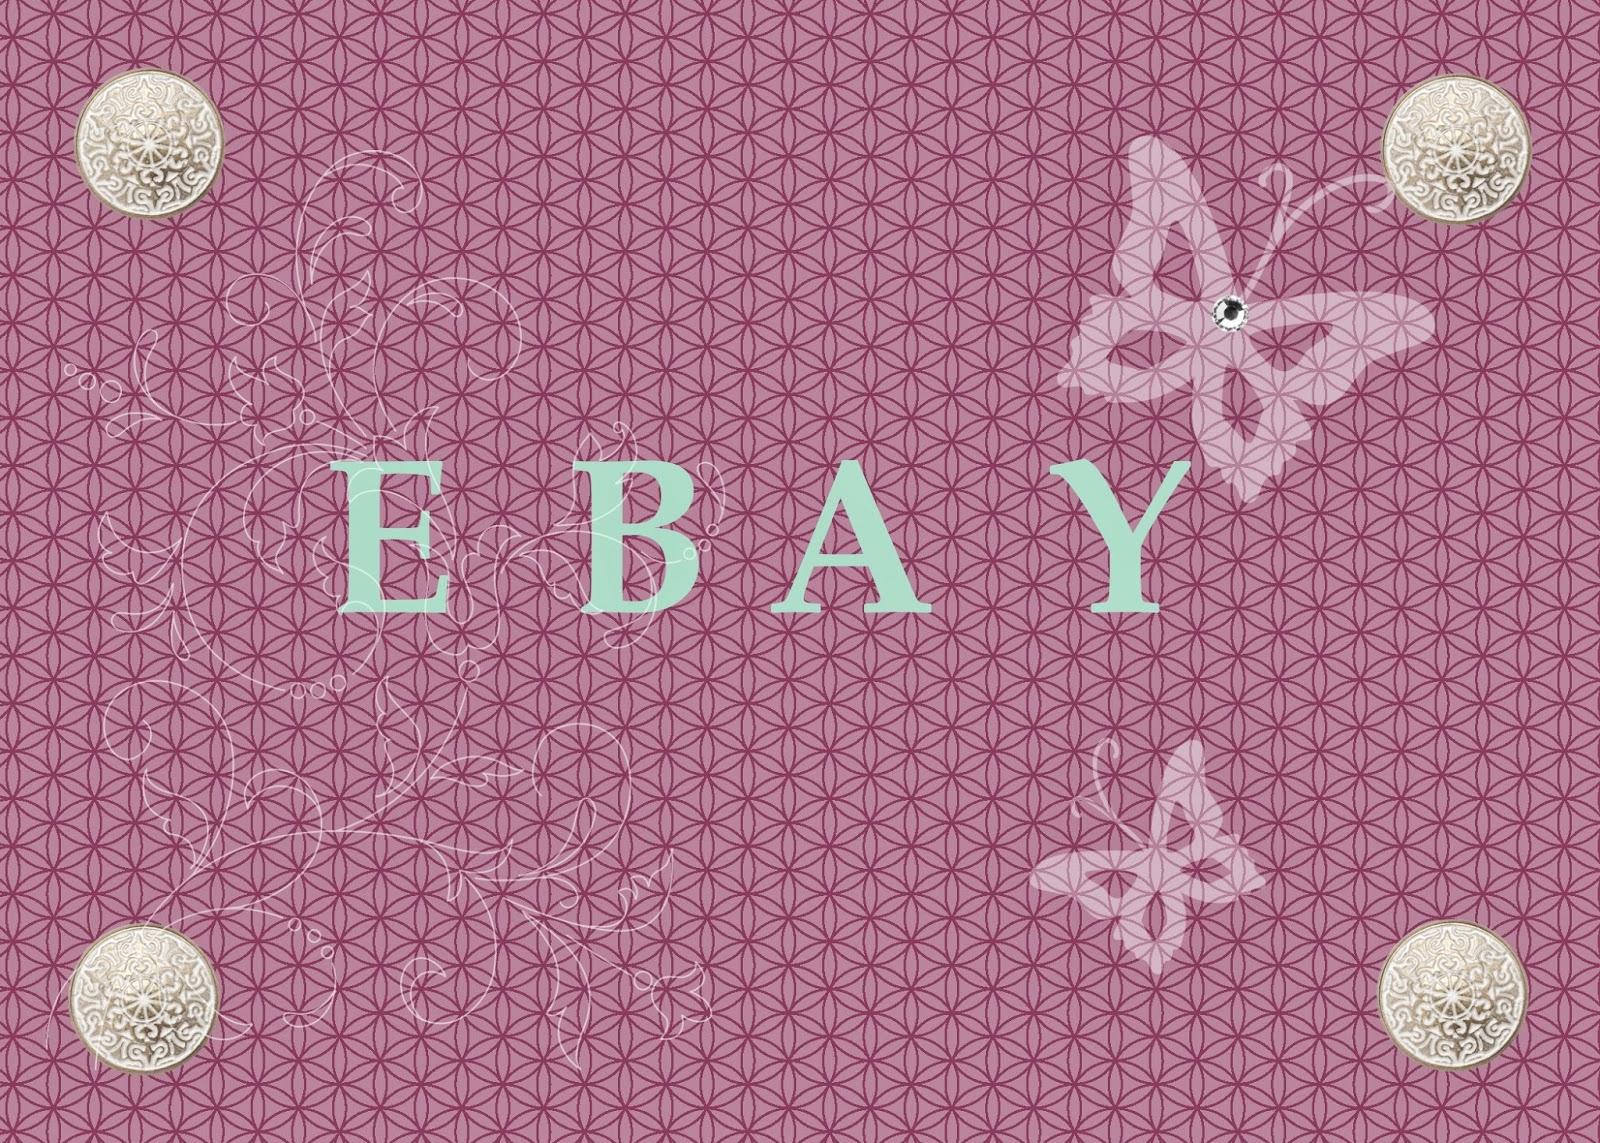 http://www.ebay.de/sch/claudinchen1981/m.html?item=261461957971&hash=item3ce058dd53&pt=Stempel&rt=nc&_trksid=p2047675.l2562